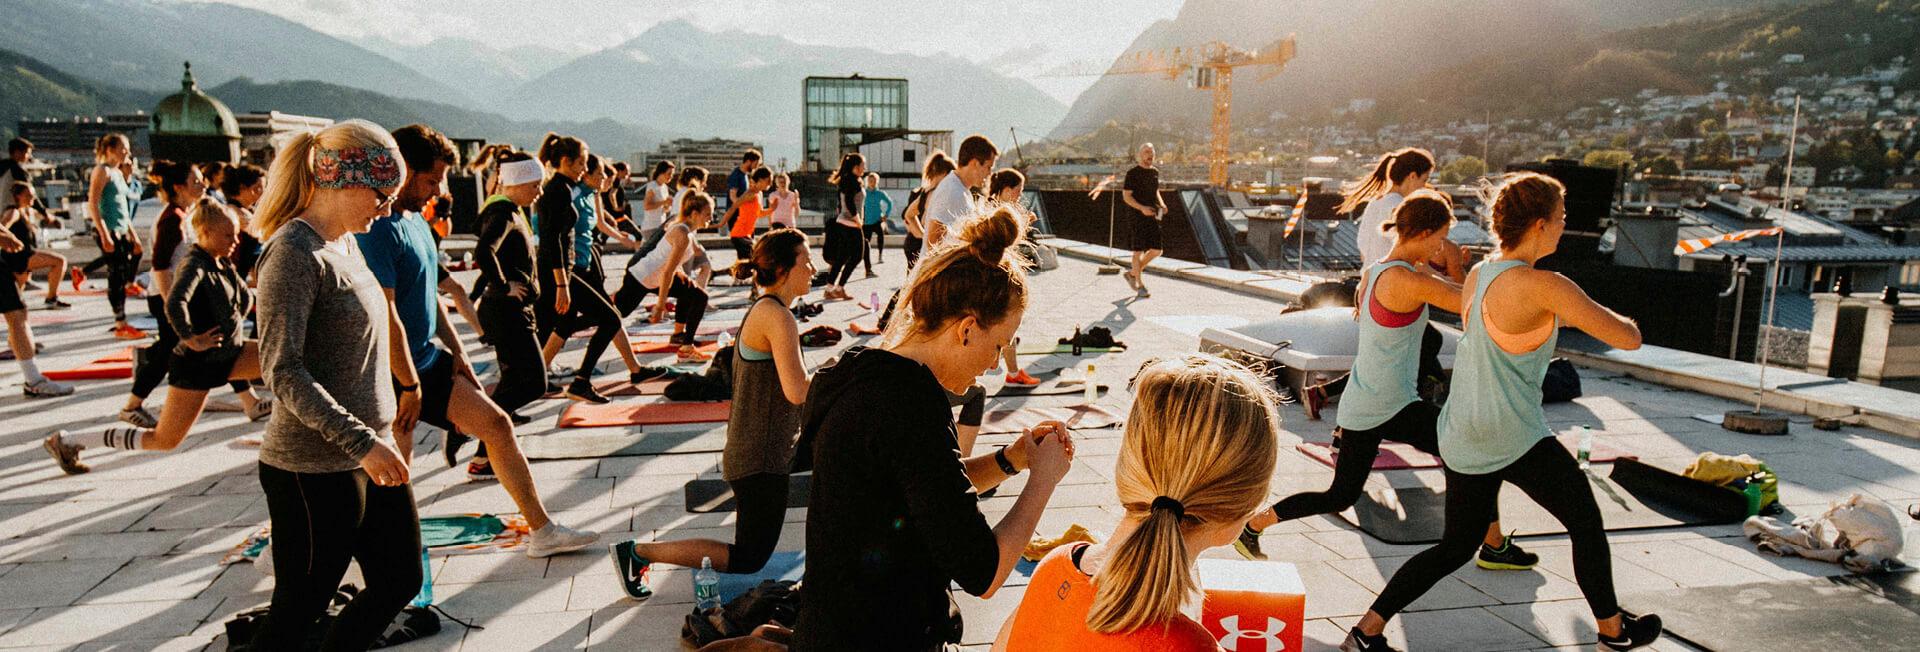 Das Training - Rooftop Session am Dach des Kaufhaus Tyrol